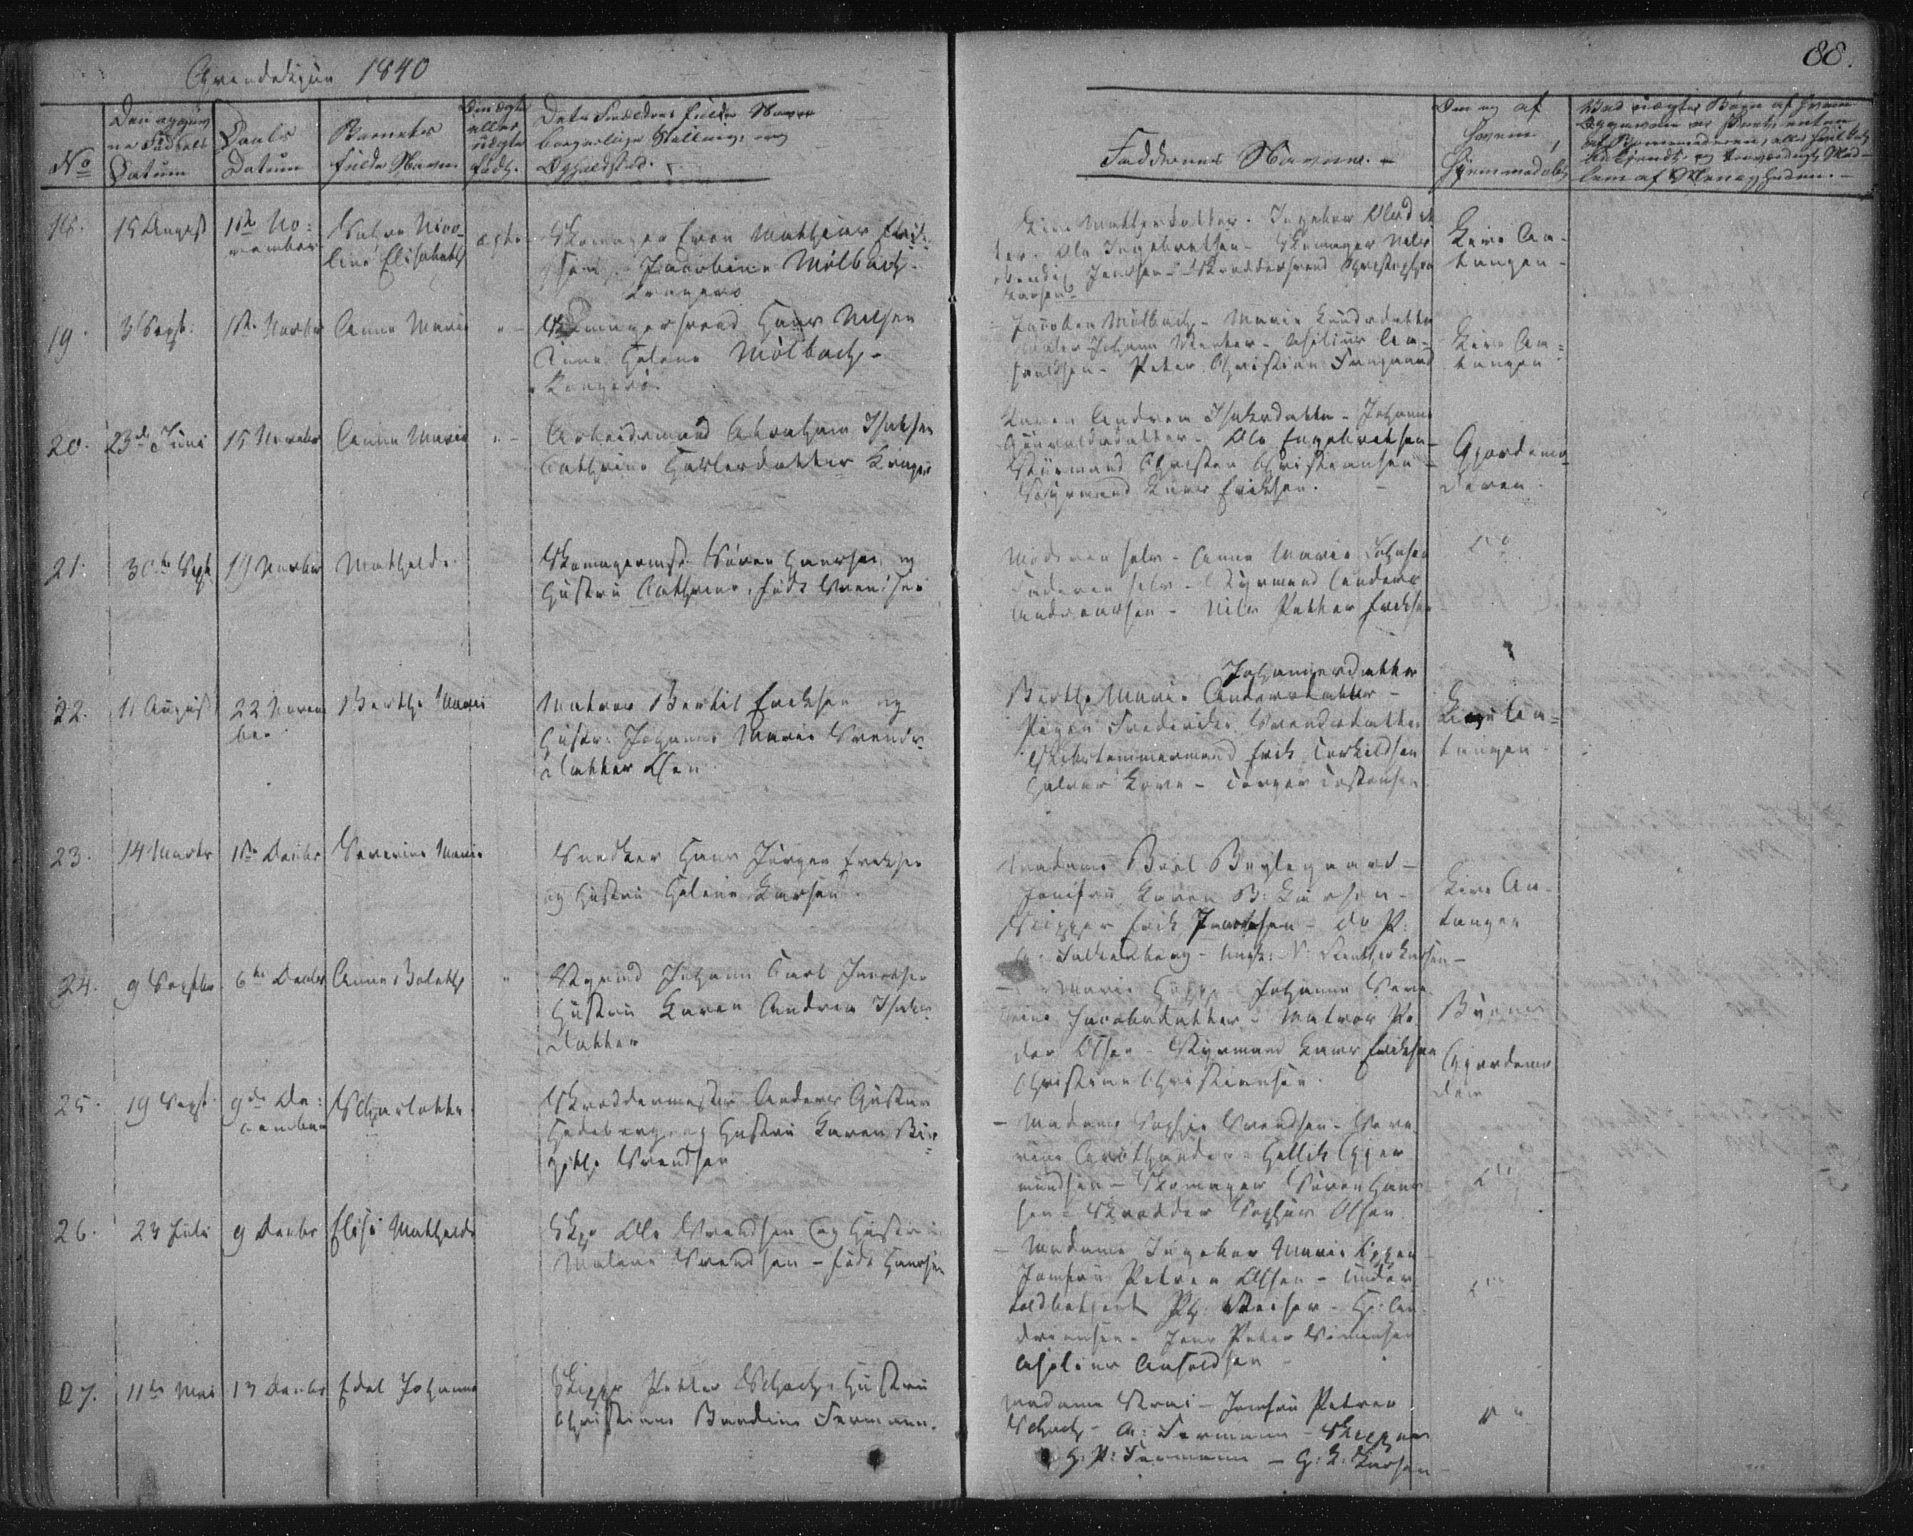 SAKO, Kragerø kirkebøker, F/Fa/L0005: Ministerialbok nr. 5, 1832-1847, s. 88